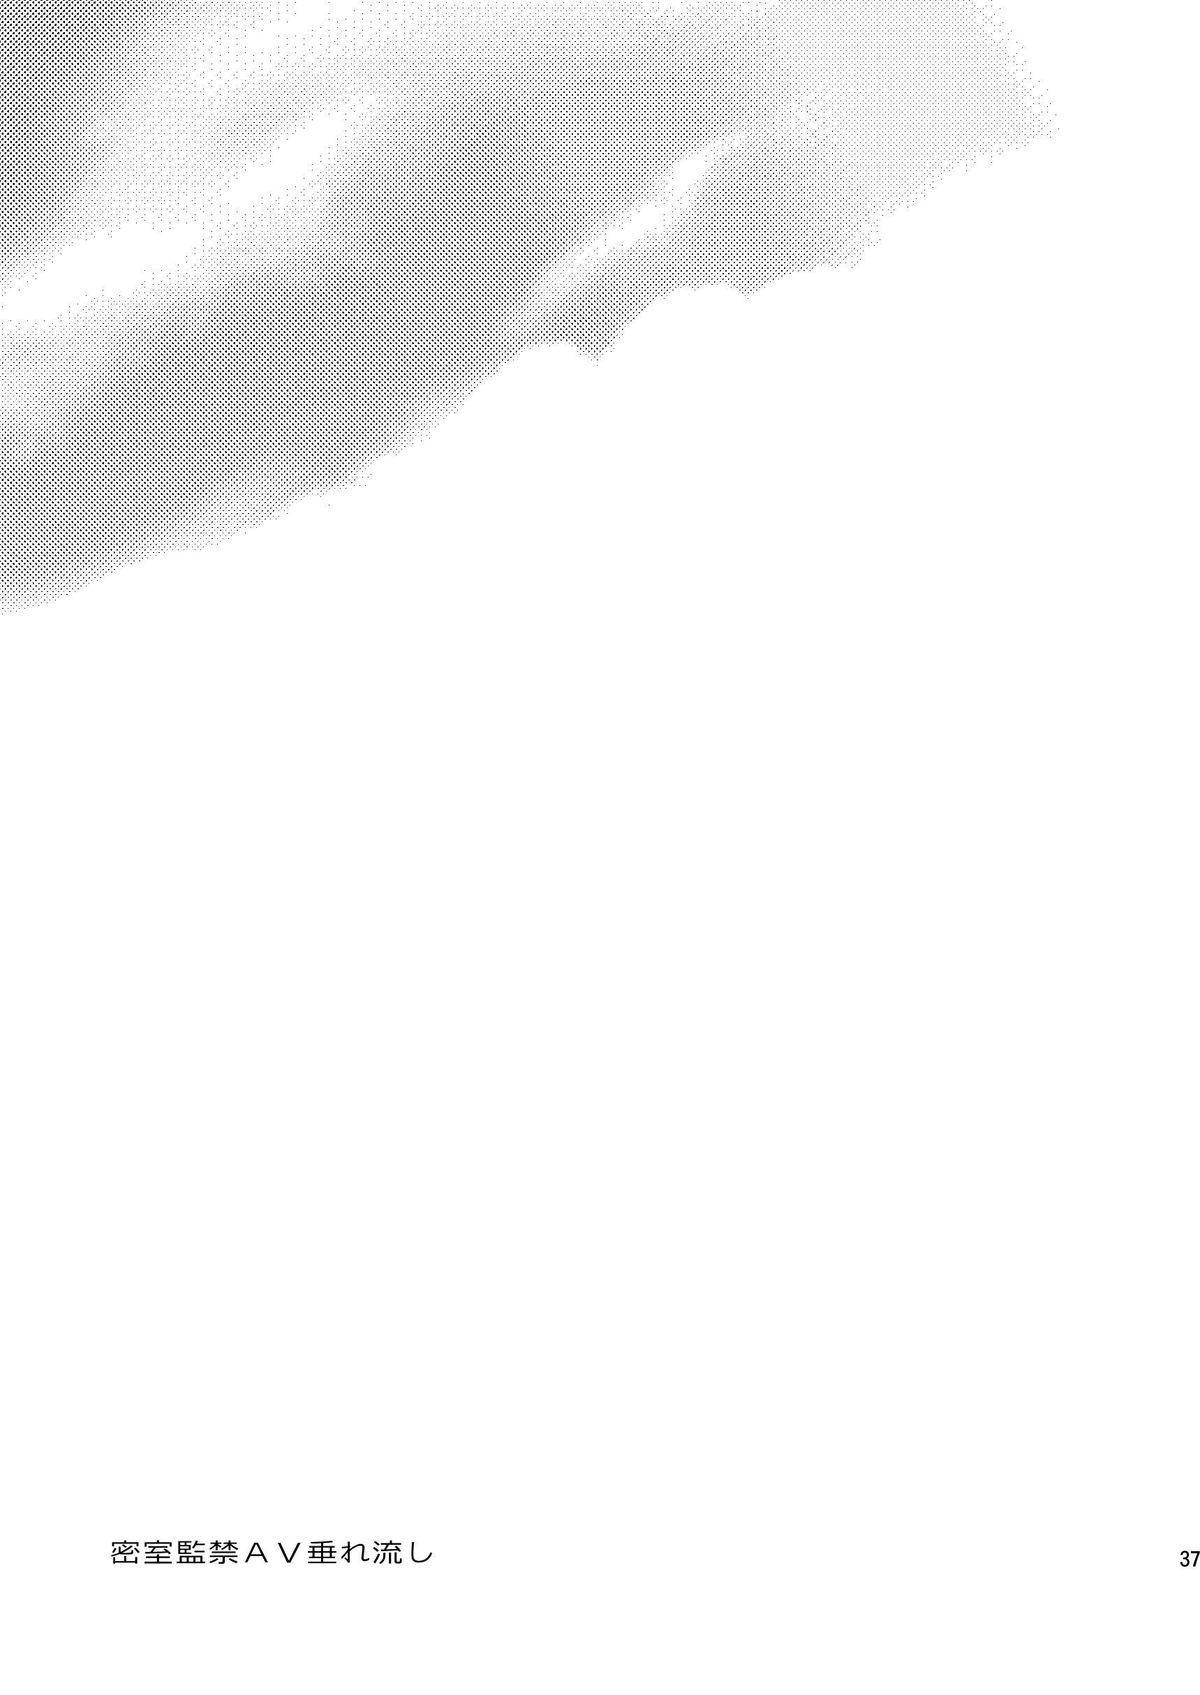 Misshitsu Kankin AV Tarenagashi | Secret Room Confinement AV Effluence 34